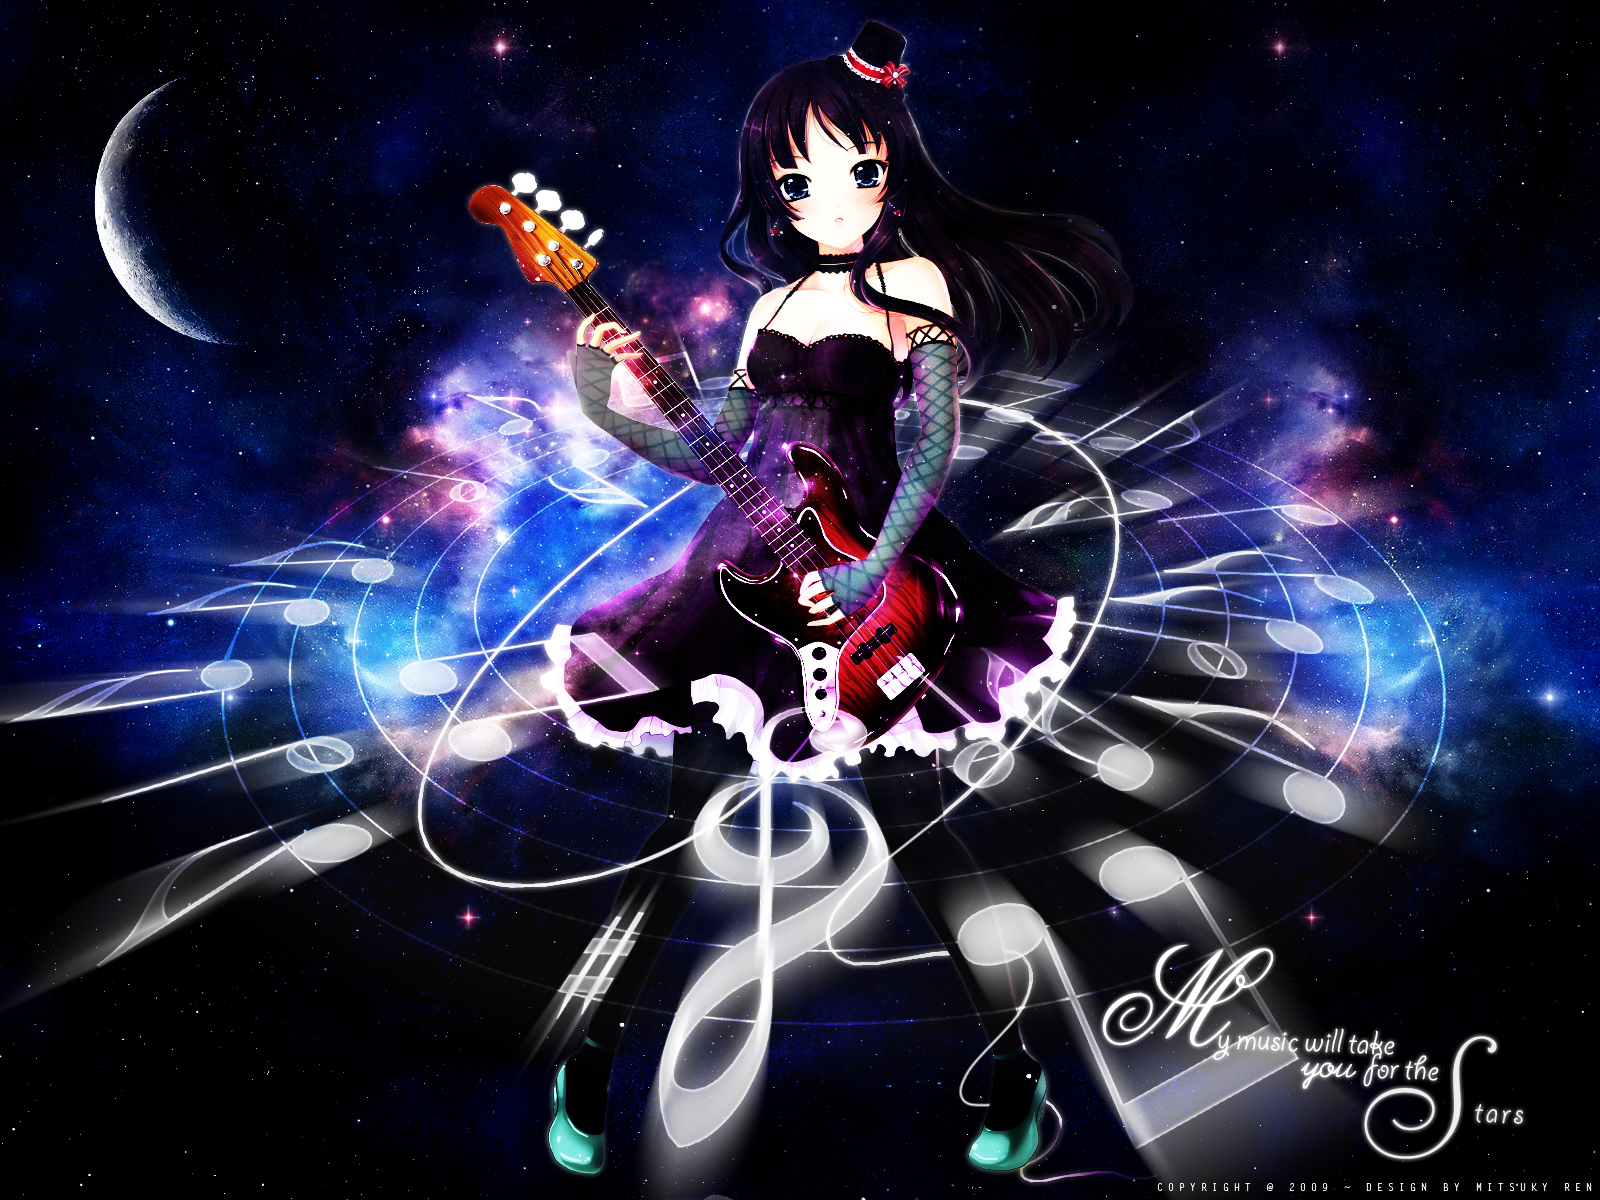 http://2.bp.blogspot.com/-Fqm3NJ6epVs/TWKgsAQOvxI/AAAAAAAADXg/p2dTFn1_AOo/s1600/My-music-will-take-you-for-the-Stars-k-on-6309956-1600-1200.jpg